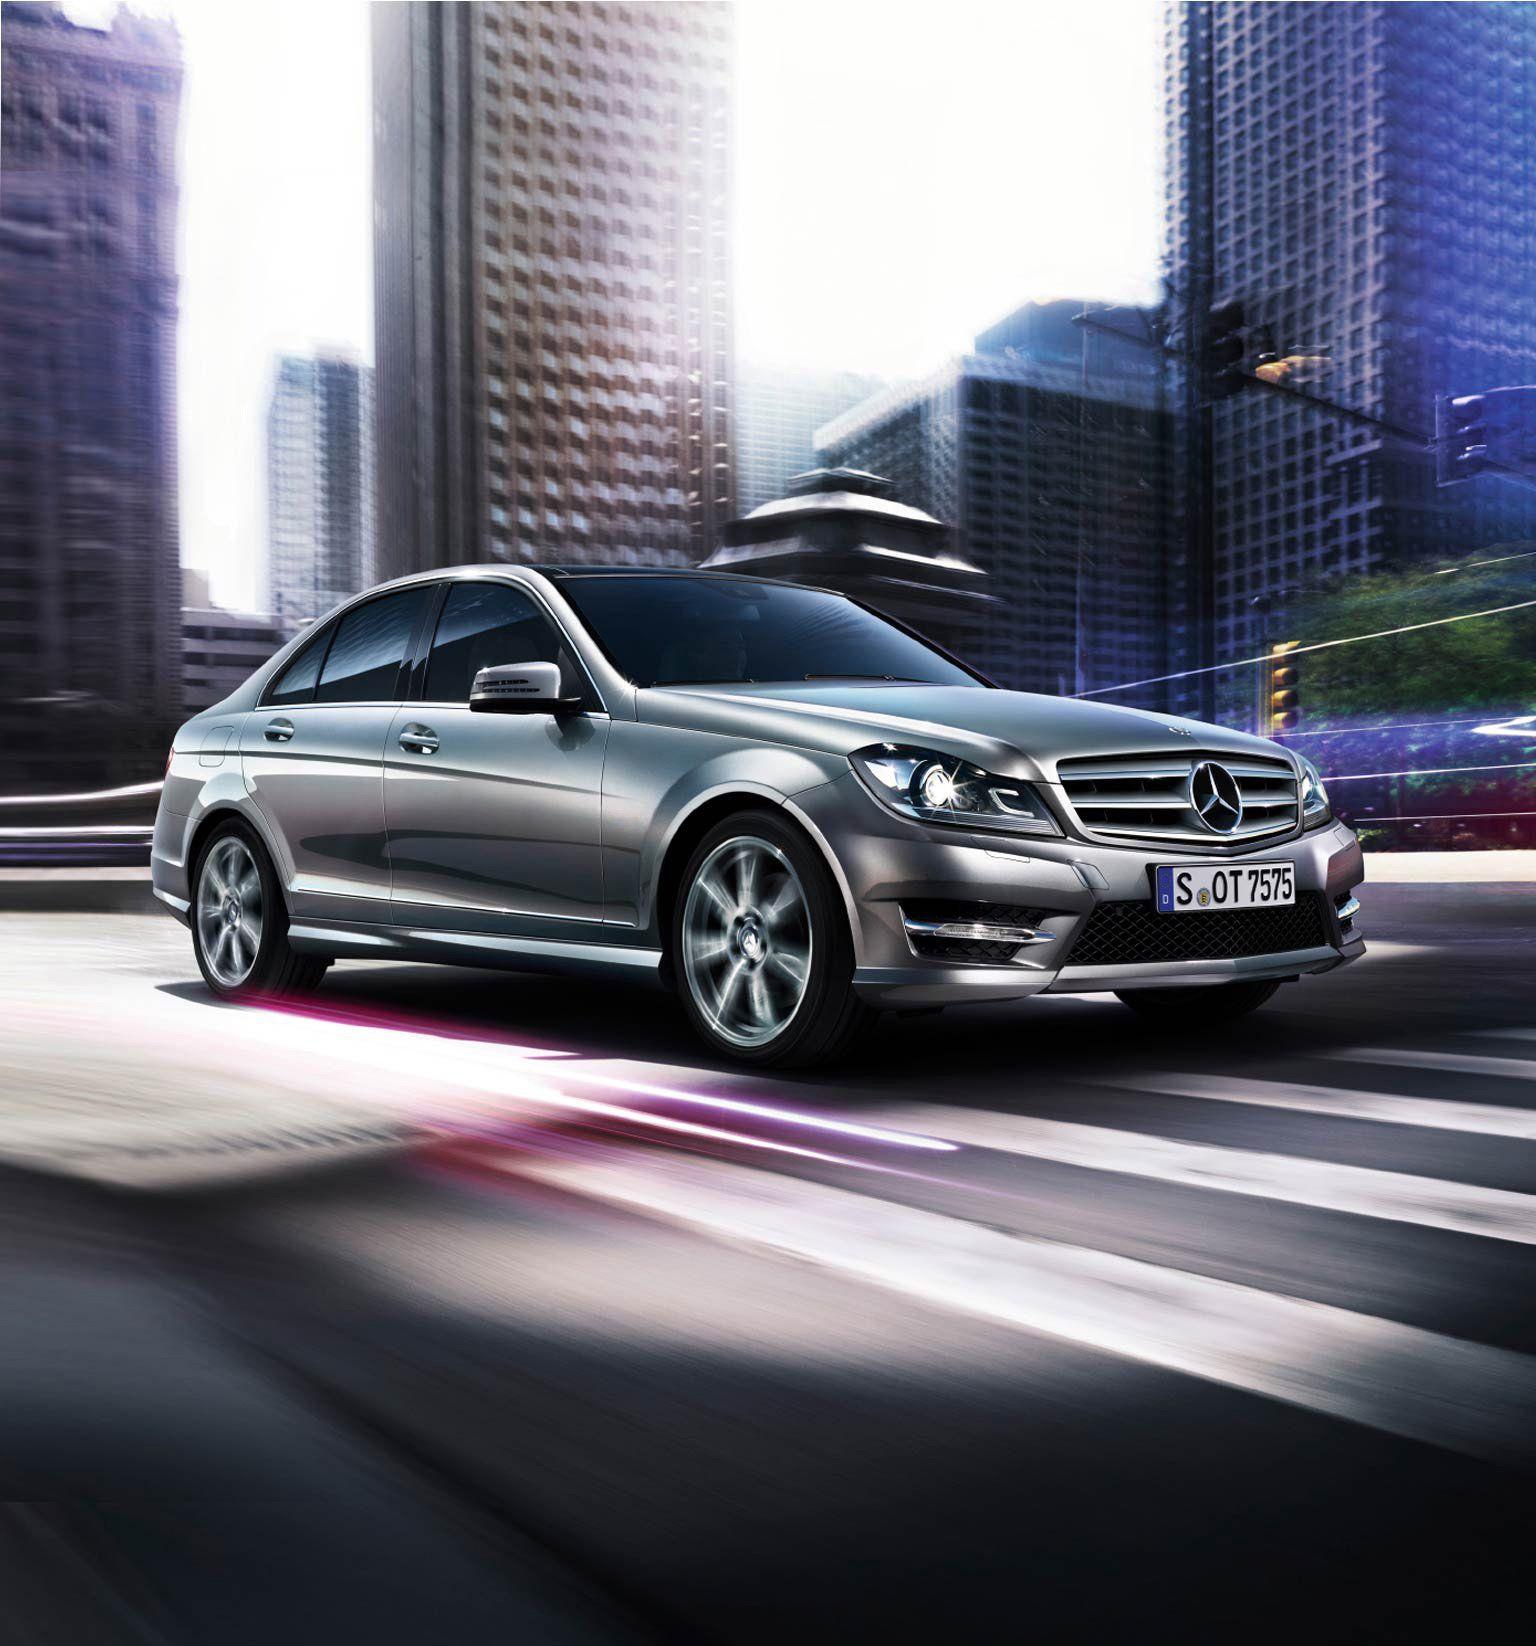 Mercedes Benz C300 Sport: Mercedes Benz C300, Sports Sedan